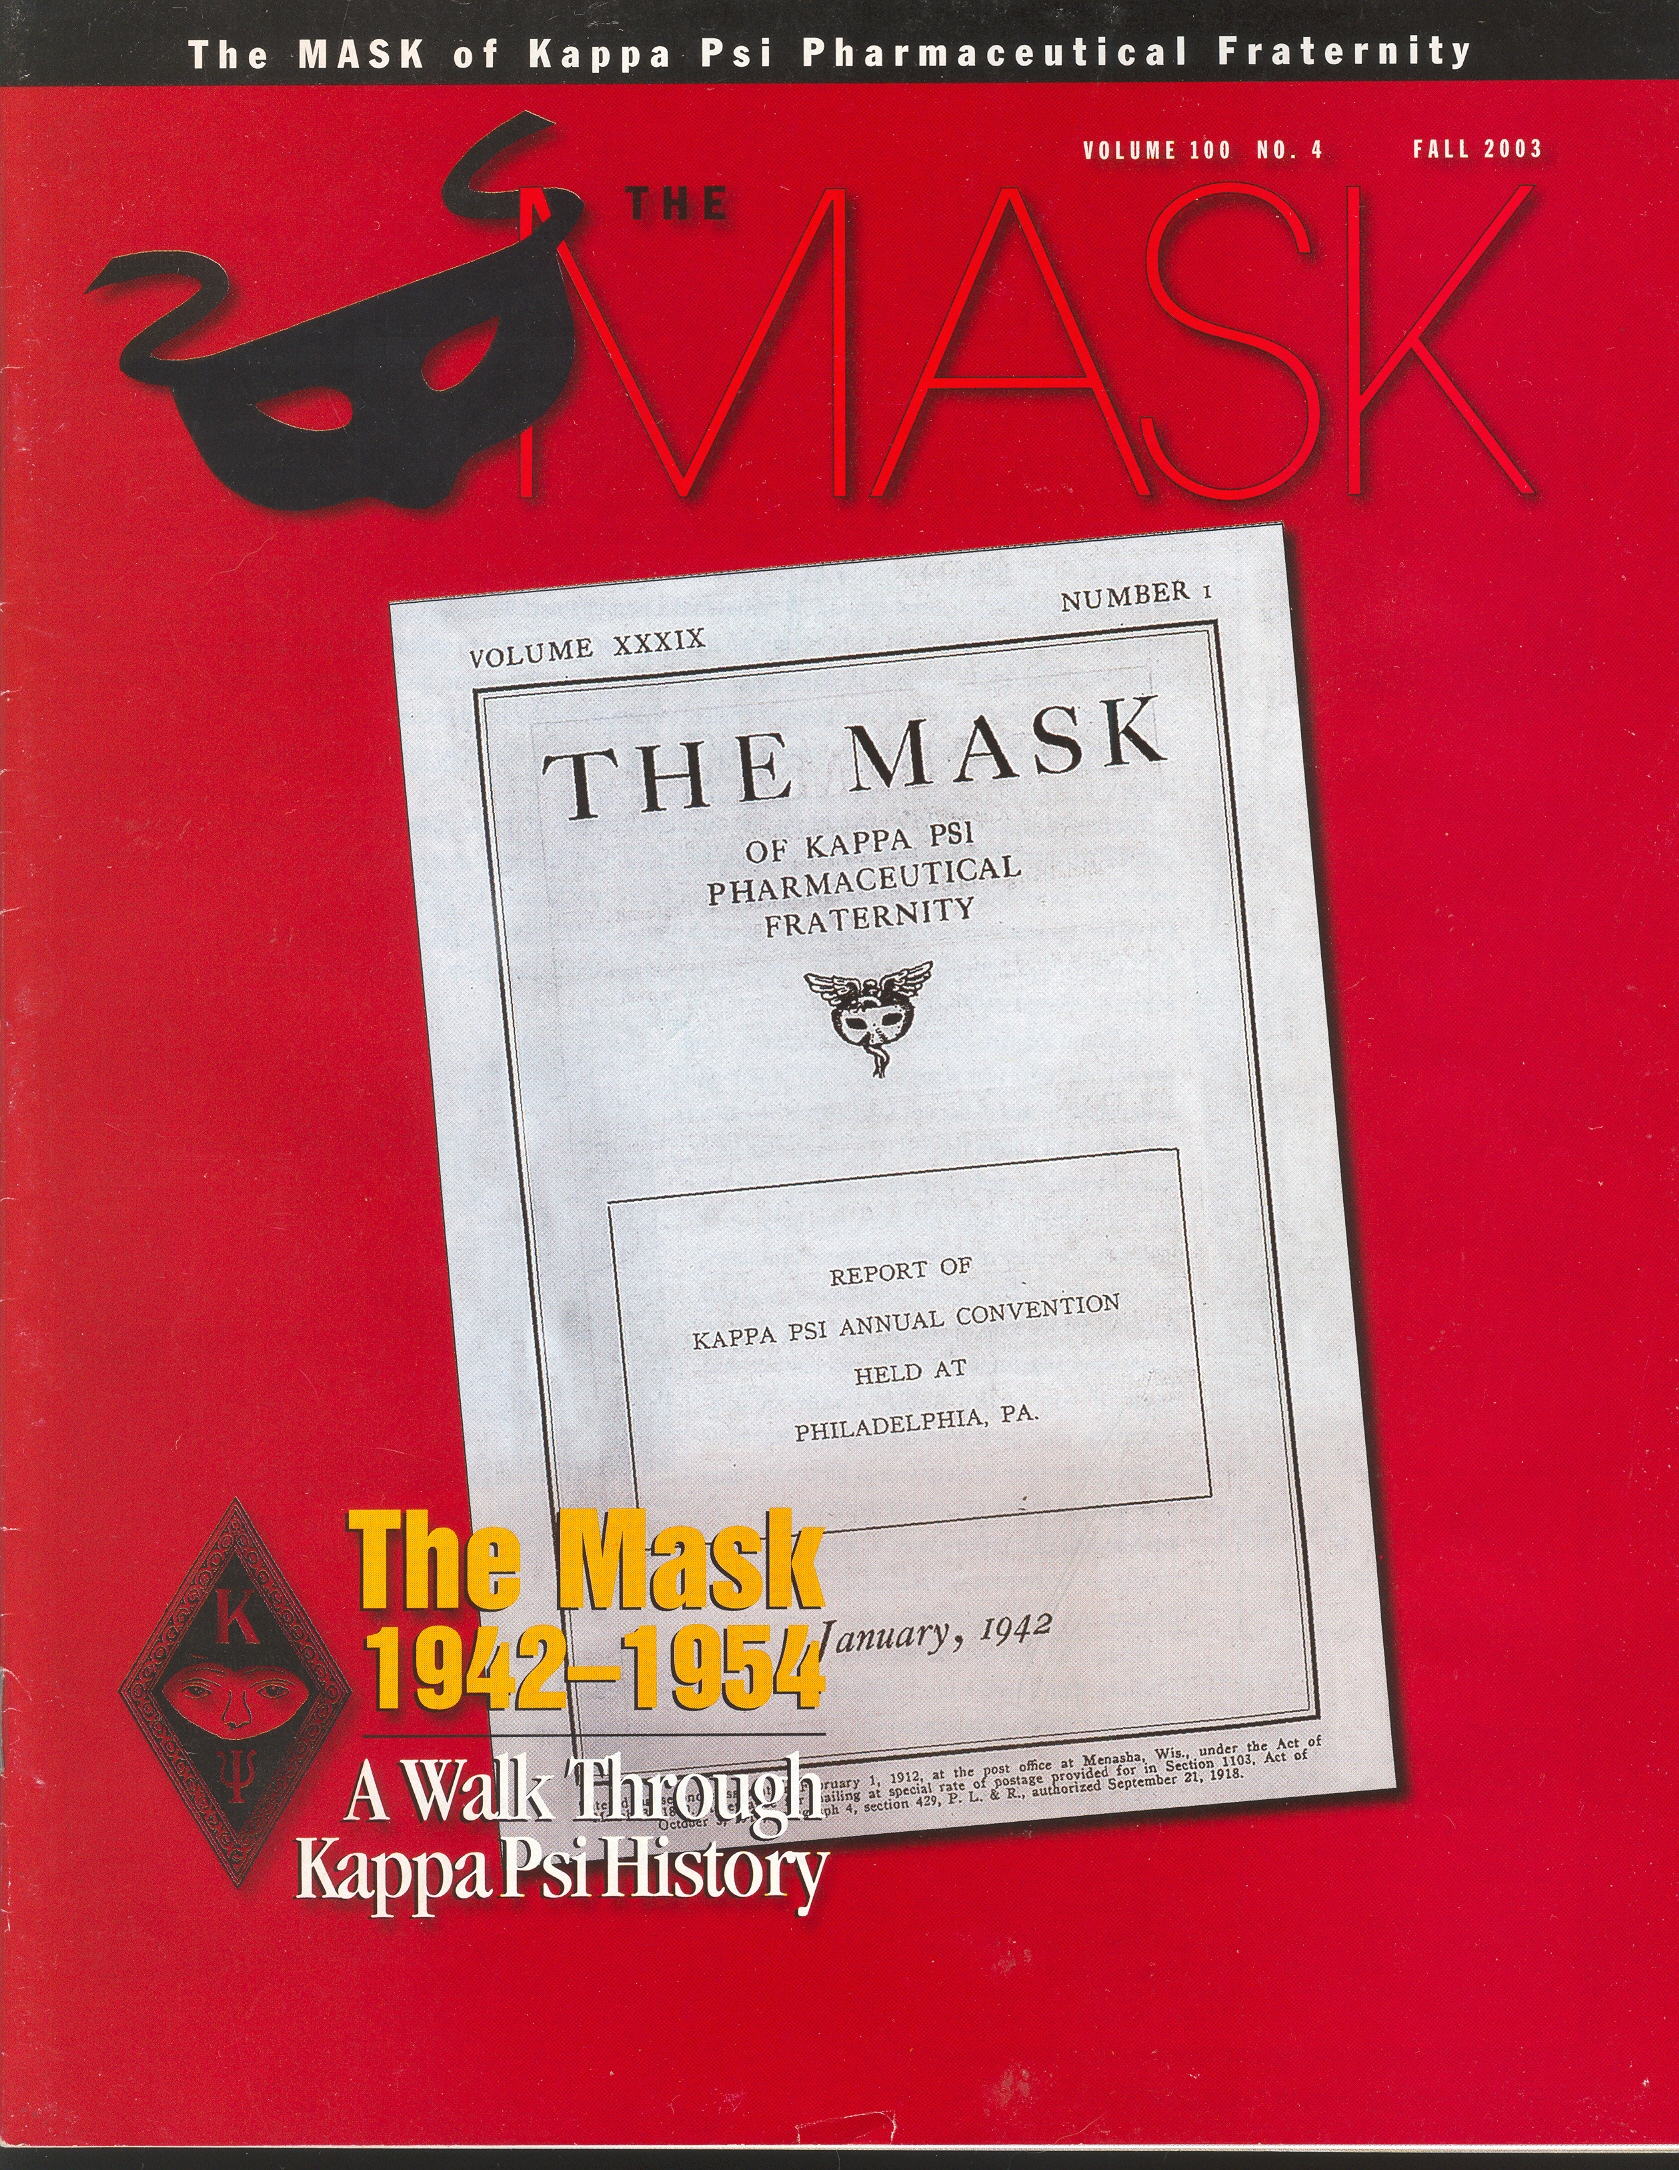 mask_cover_100-4_2003_fall.jpg